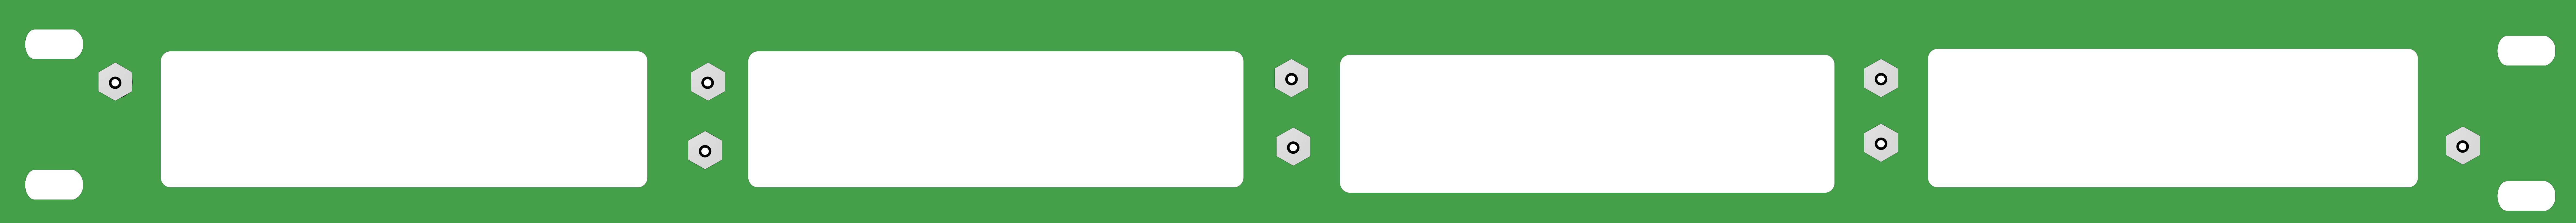 1U 4 Slot Rack Mount Plate-Blank